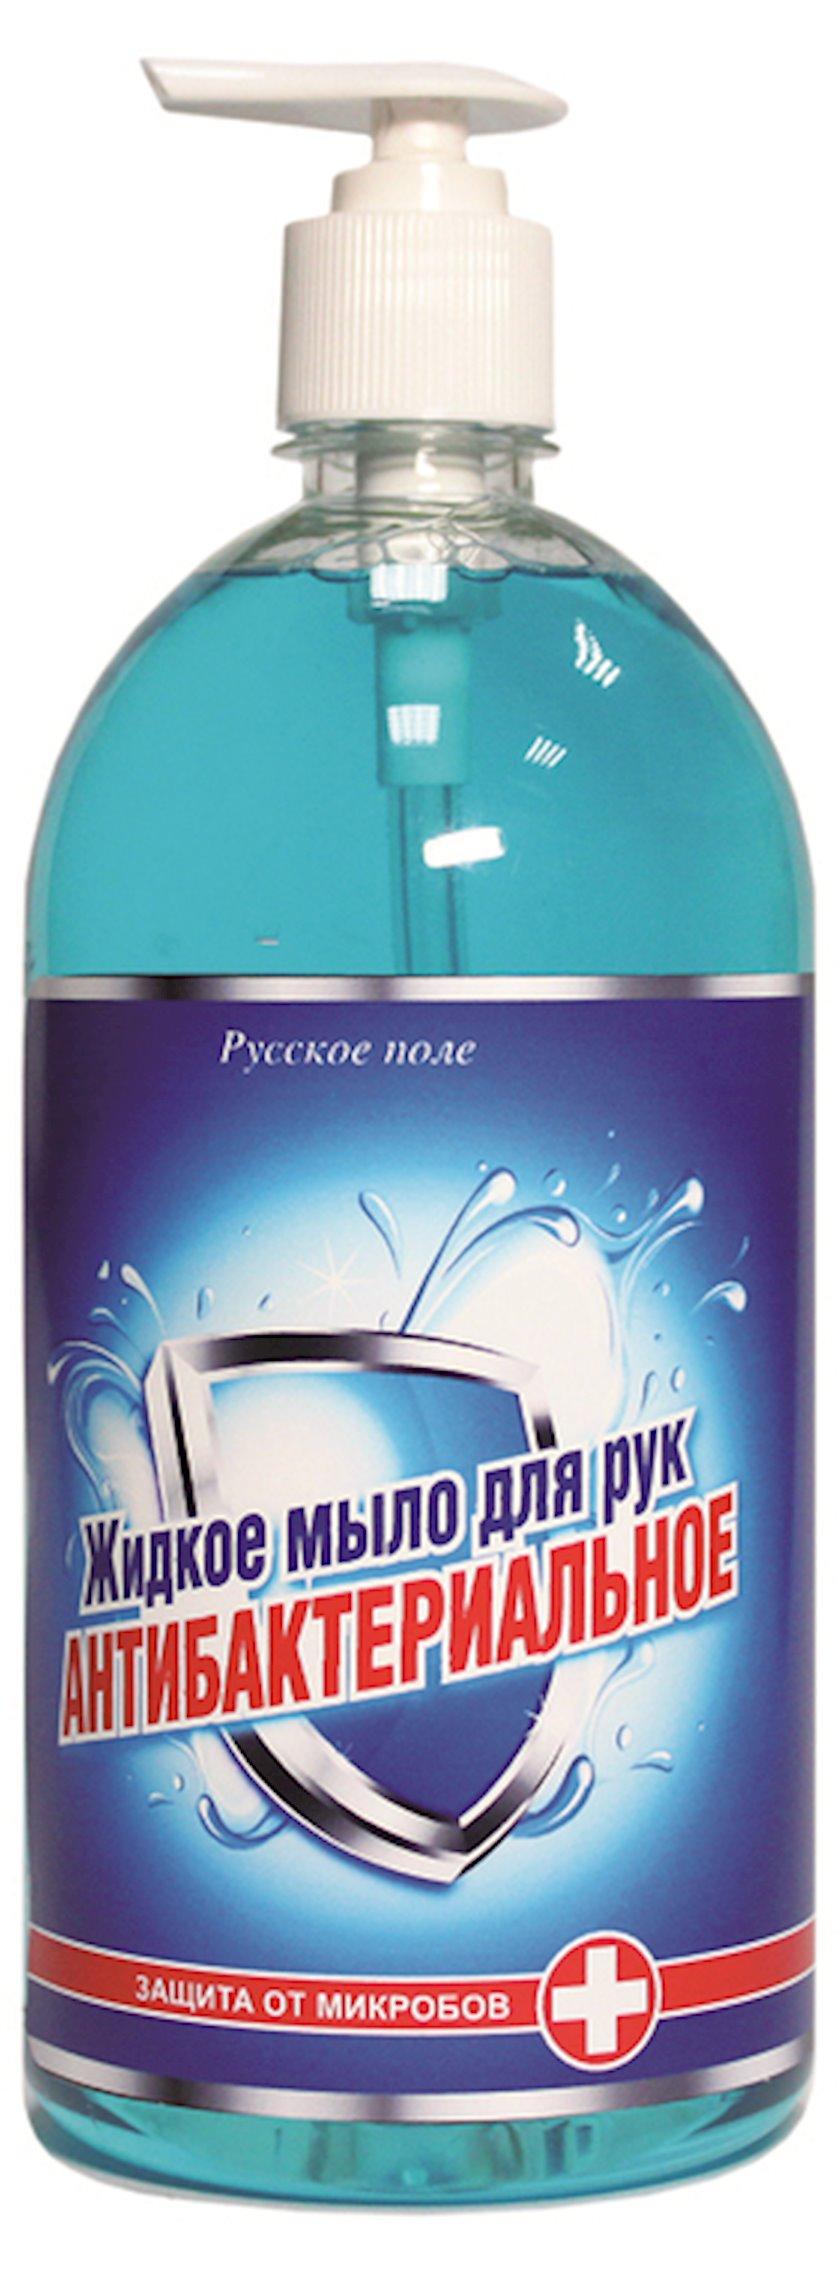 Antibakterial maye sabun Fratti Русское Поле 1000 ml